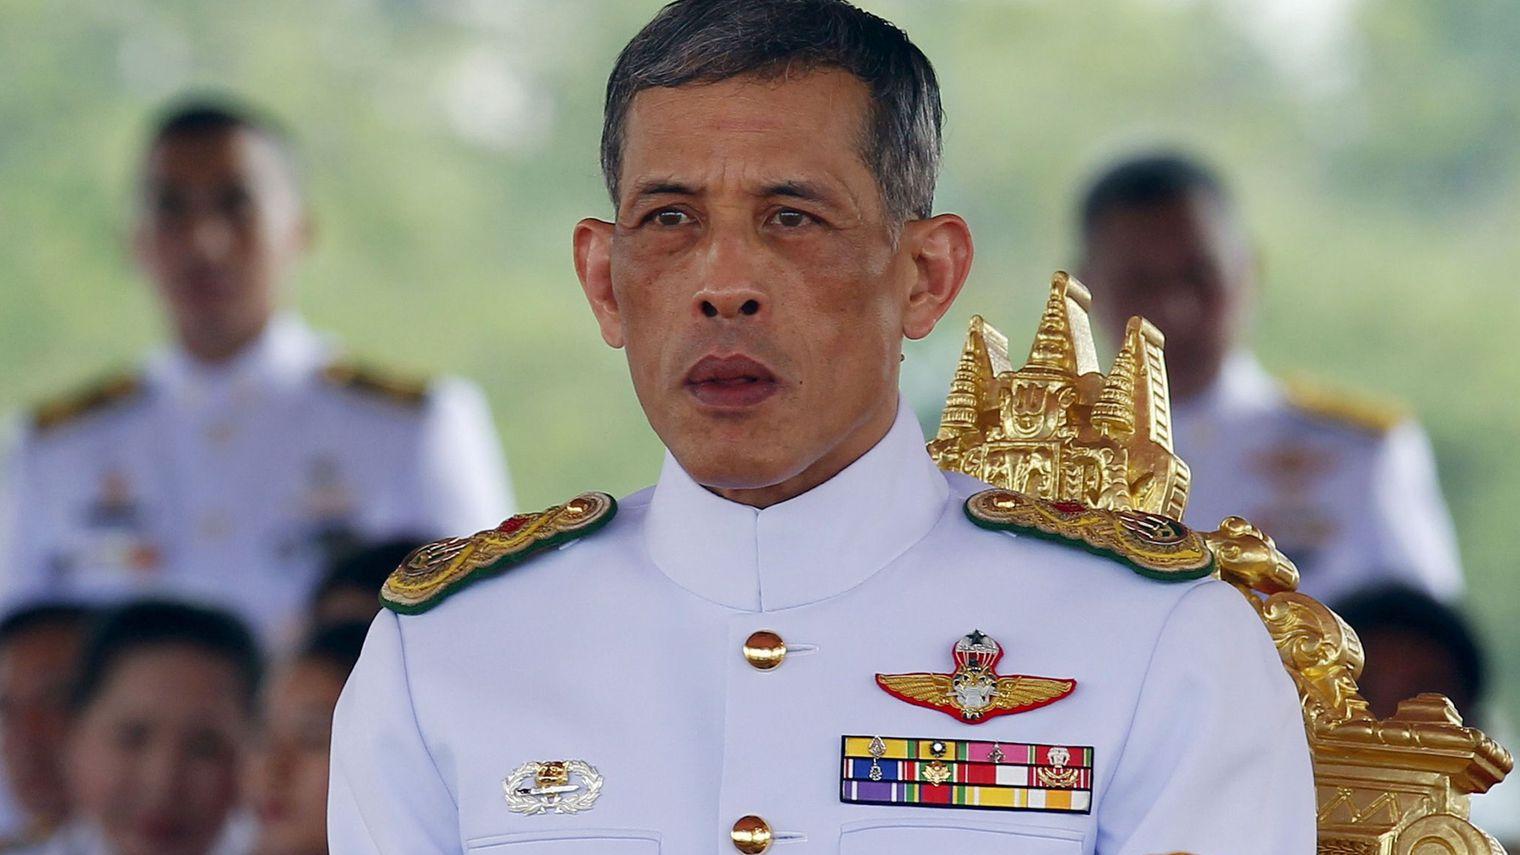 le-prince-heritier-thailandais-maha-vajiralongkorn-bangkok_5726091